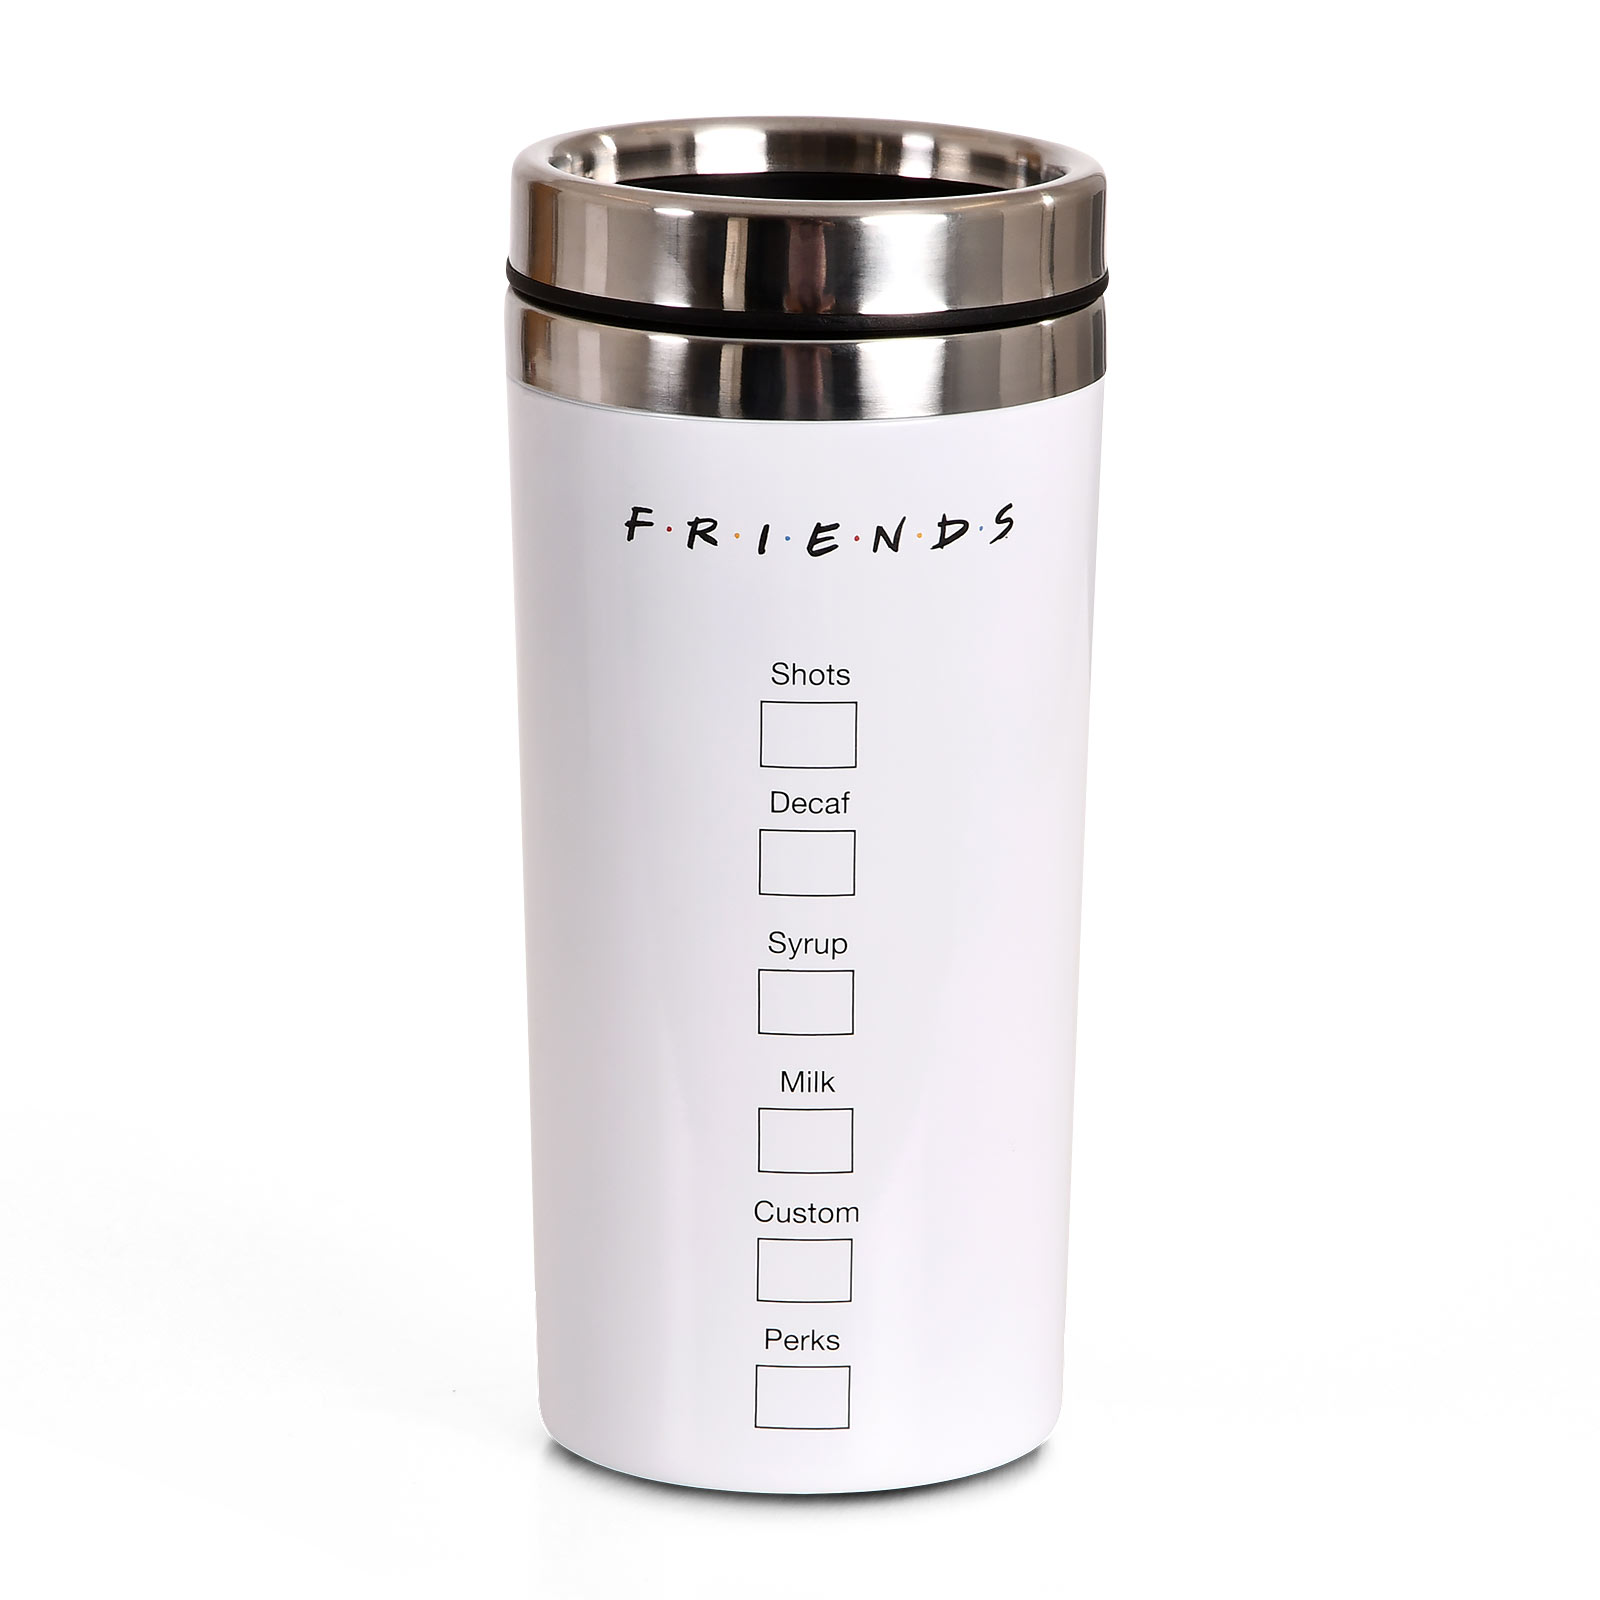 Friends - Central Perk To Go Becher